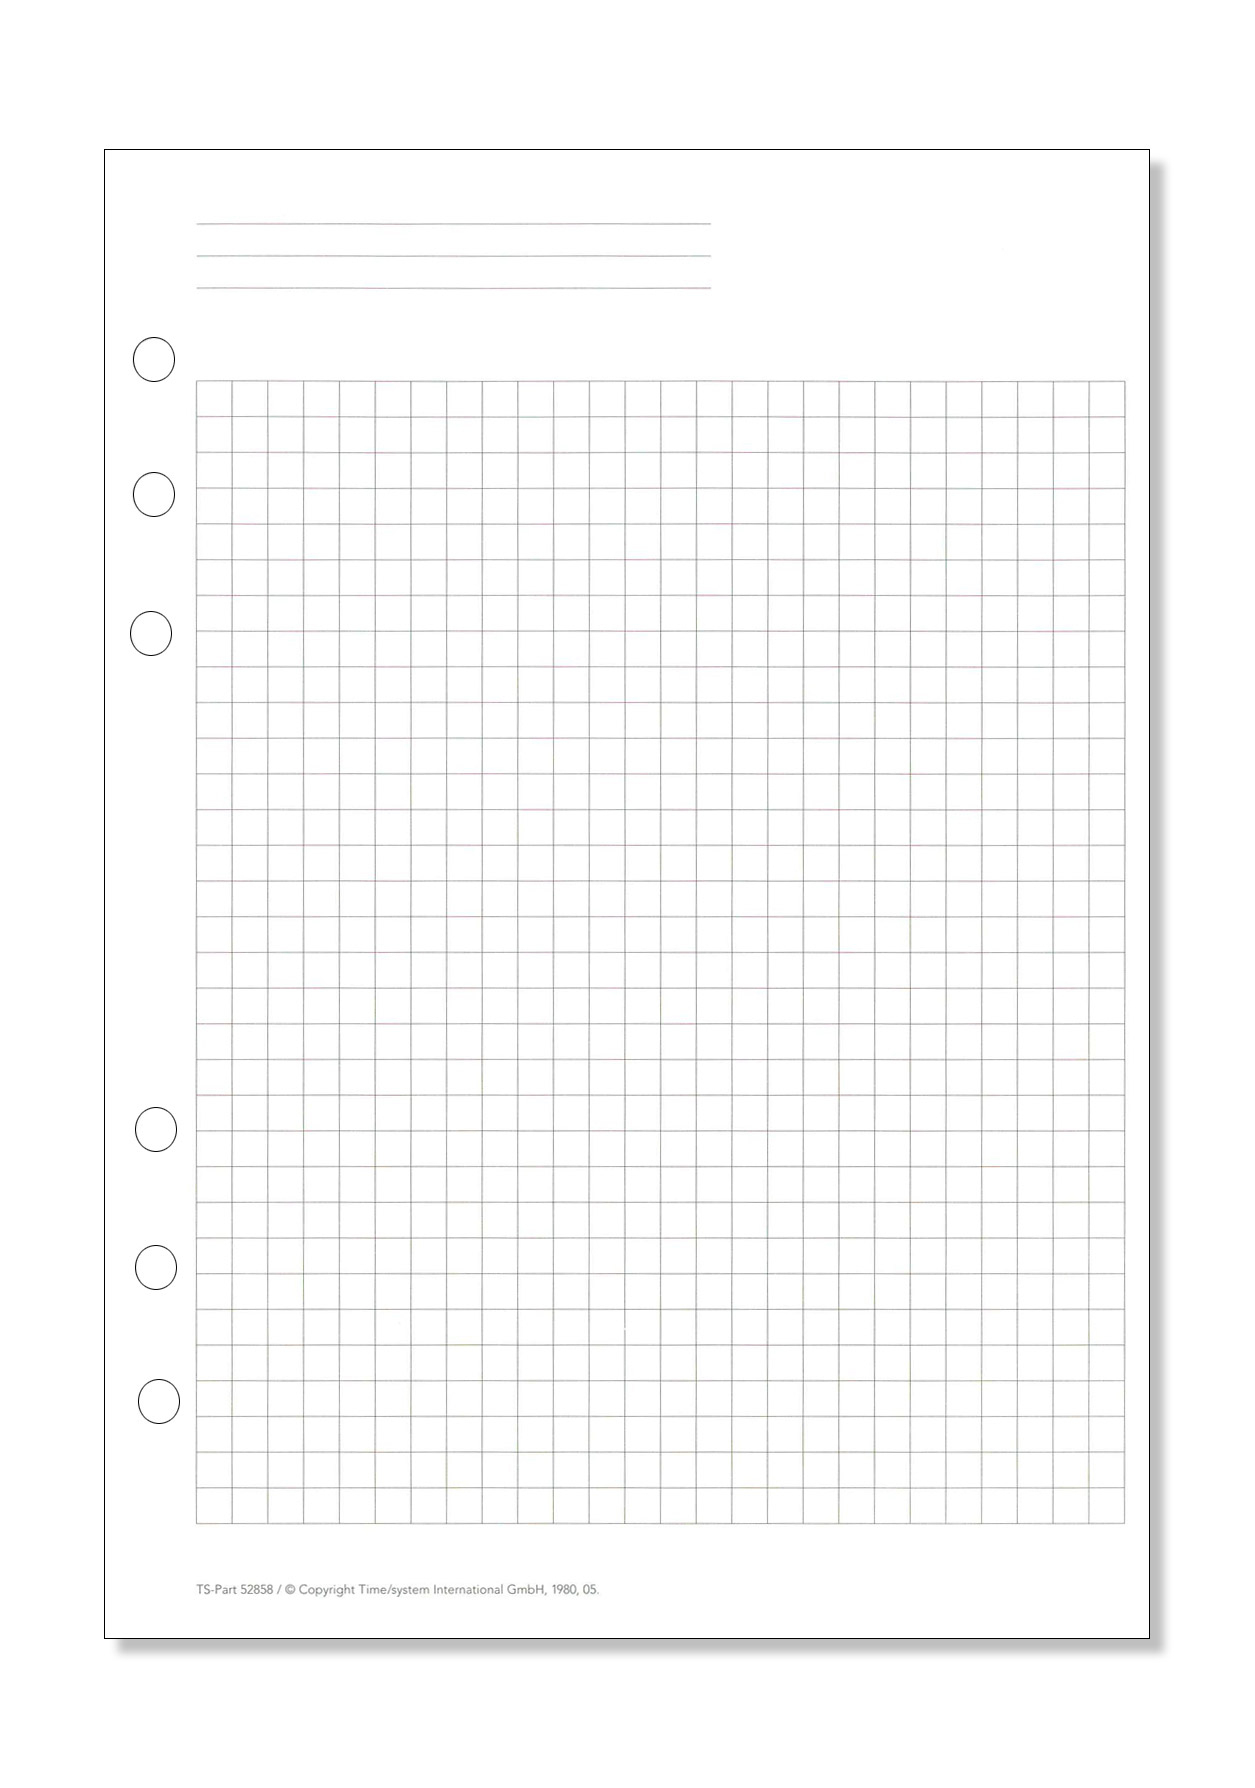 Time/system A5 Formblatt Kariertes Papier über Kariertes Blatt